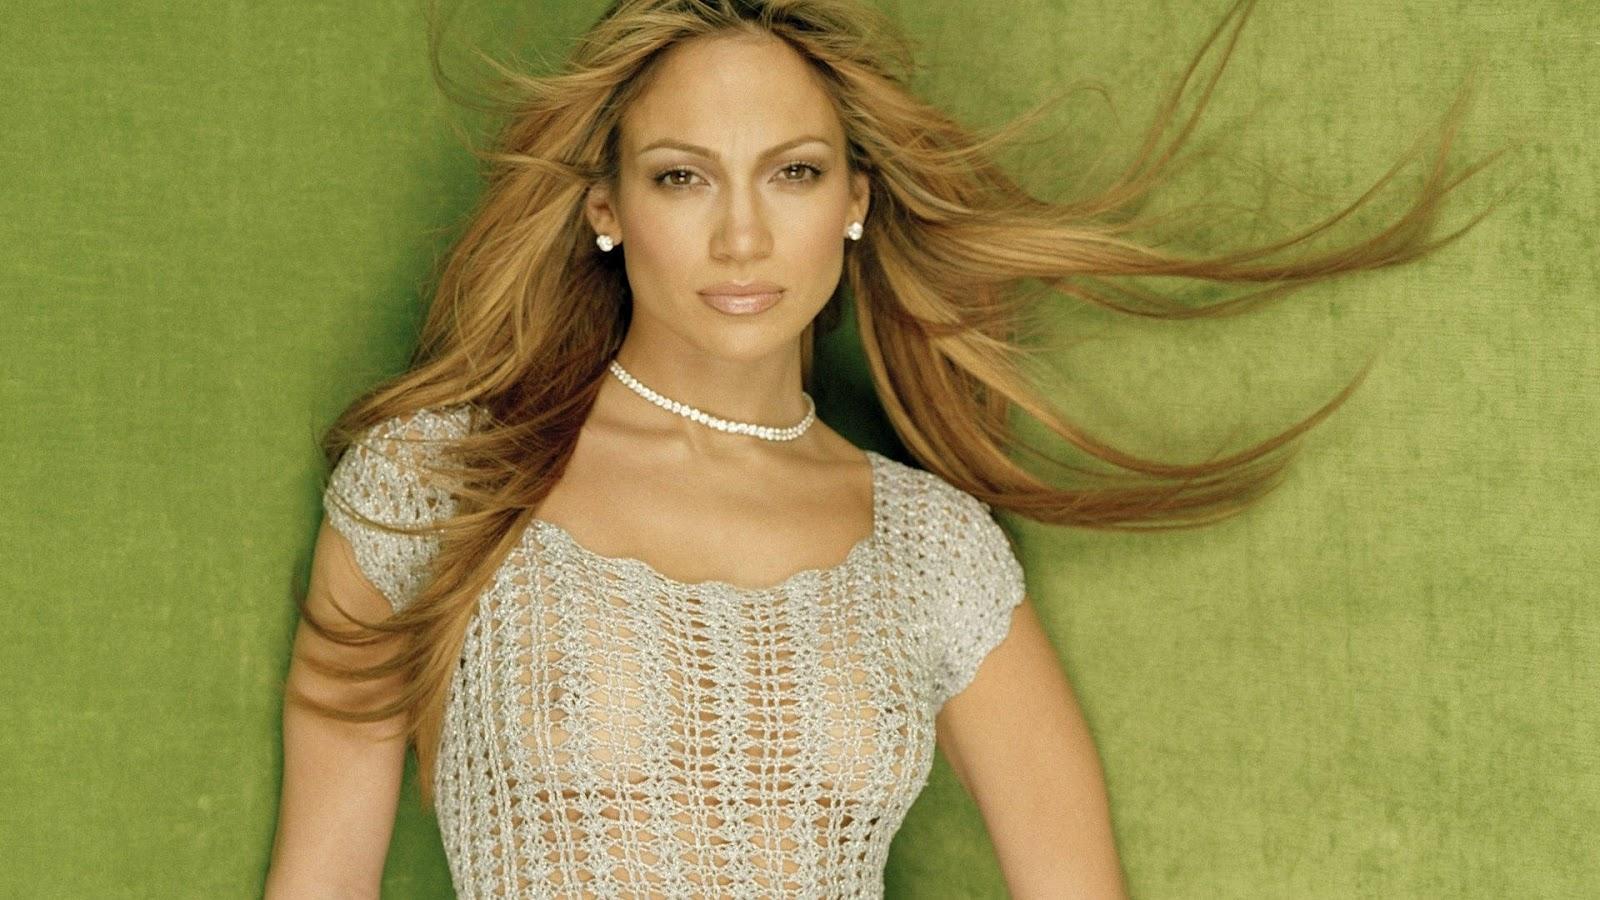 http://3.bp.blogspot.com/-YVrI67TBaxE/T-2h4e32YbI/AAAAAAAADbI/UhB7vb7C5_g/s1600/Jennifer+Lopez+hd+Wallpapers+2012_2.jpg